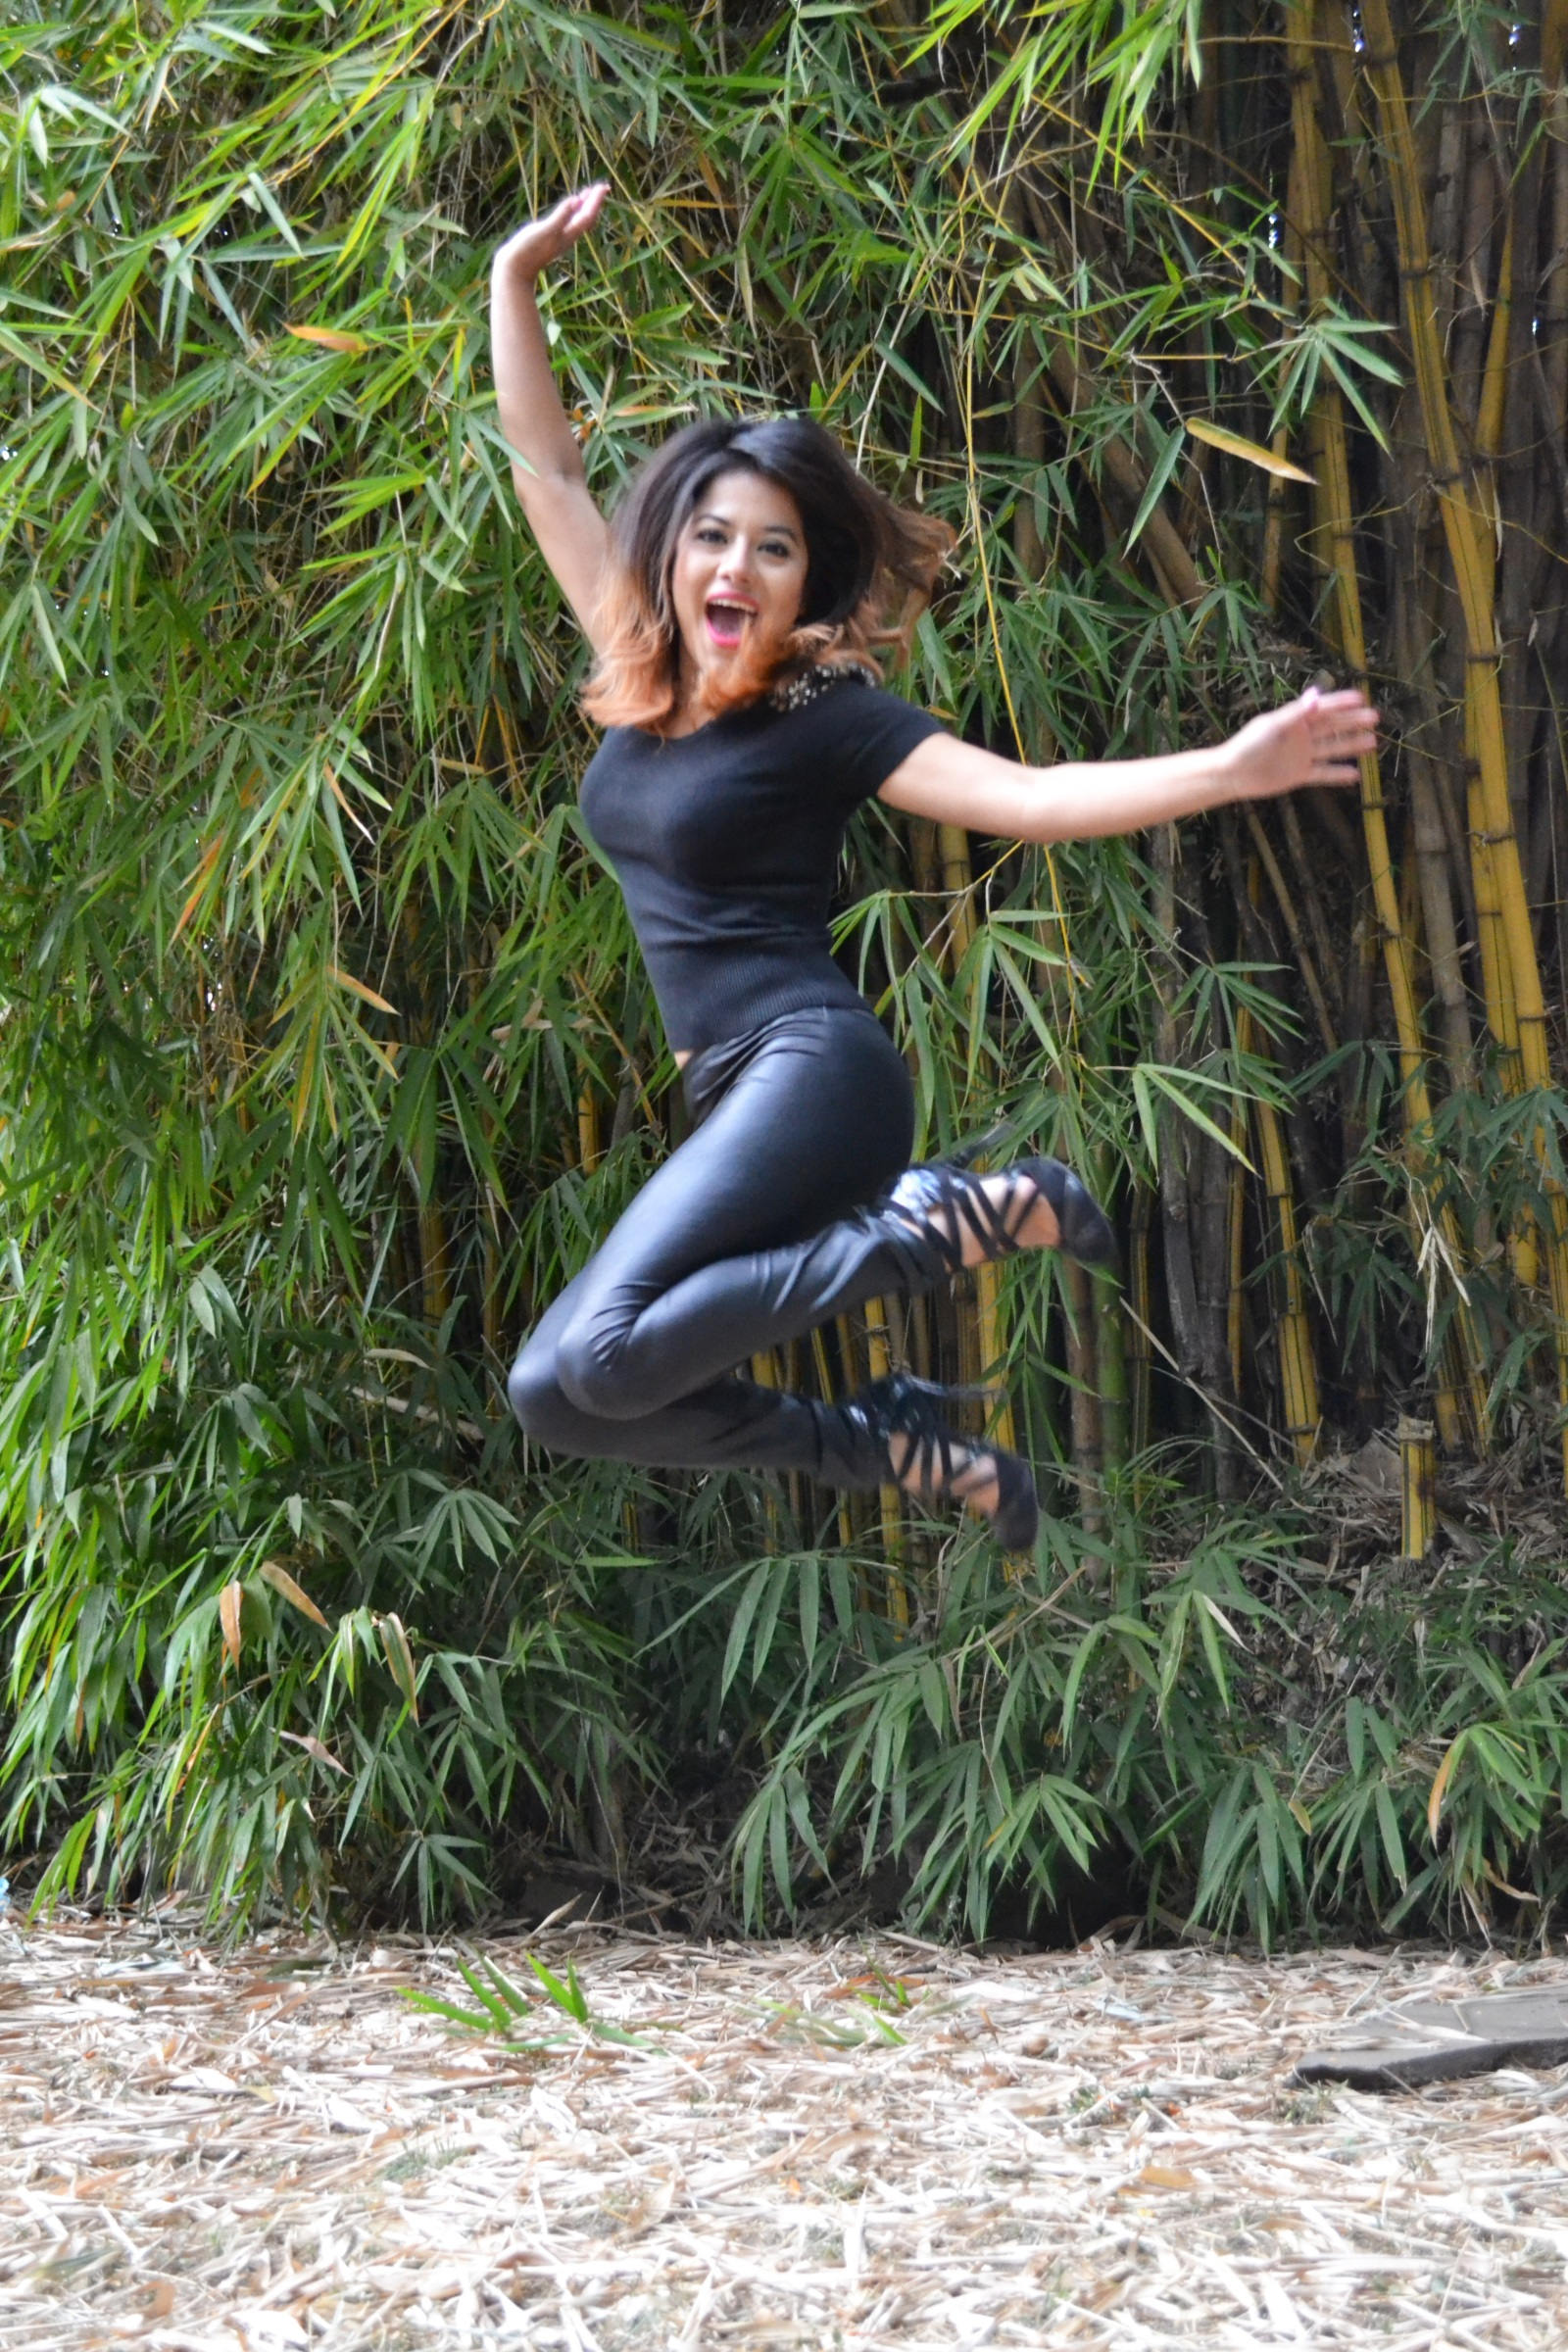 alhely-can-fly-girlsjump